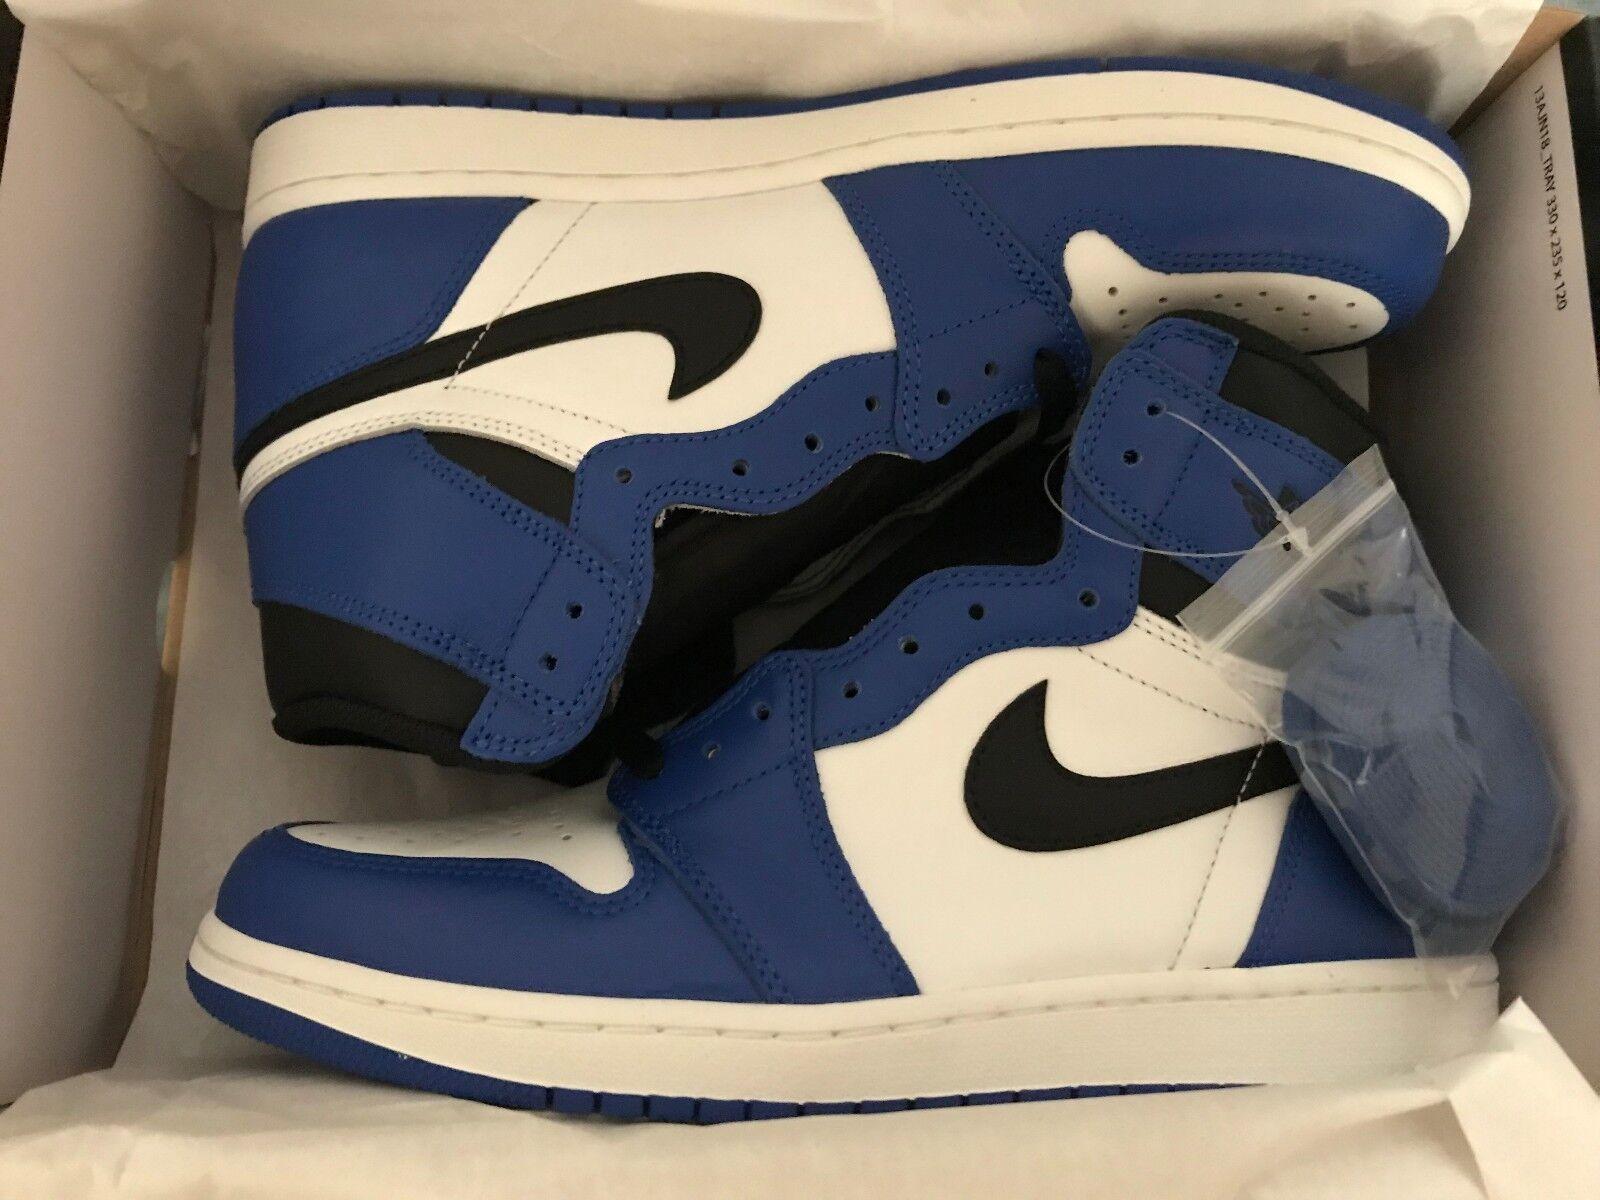 IN HANDS NEW DS Nike Air Jordan 1 Retro High OG Game Royal 555088-403 Size 11